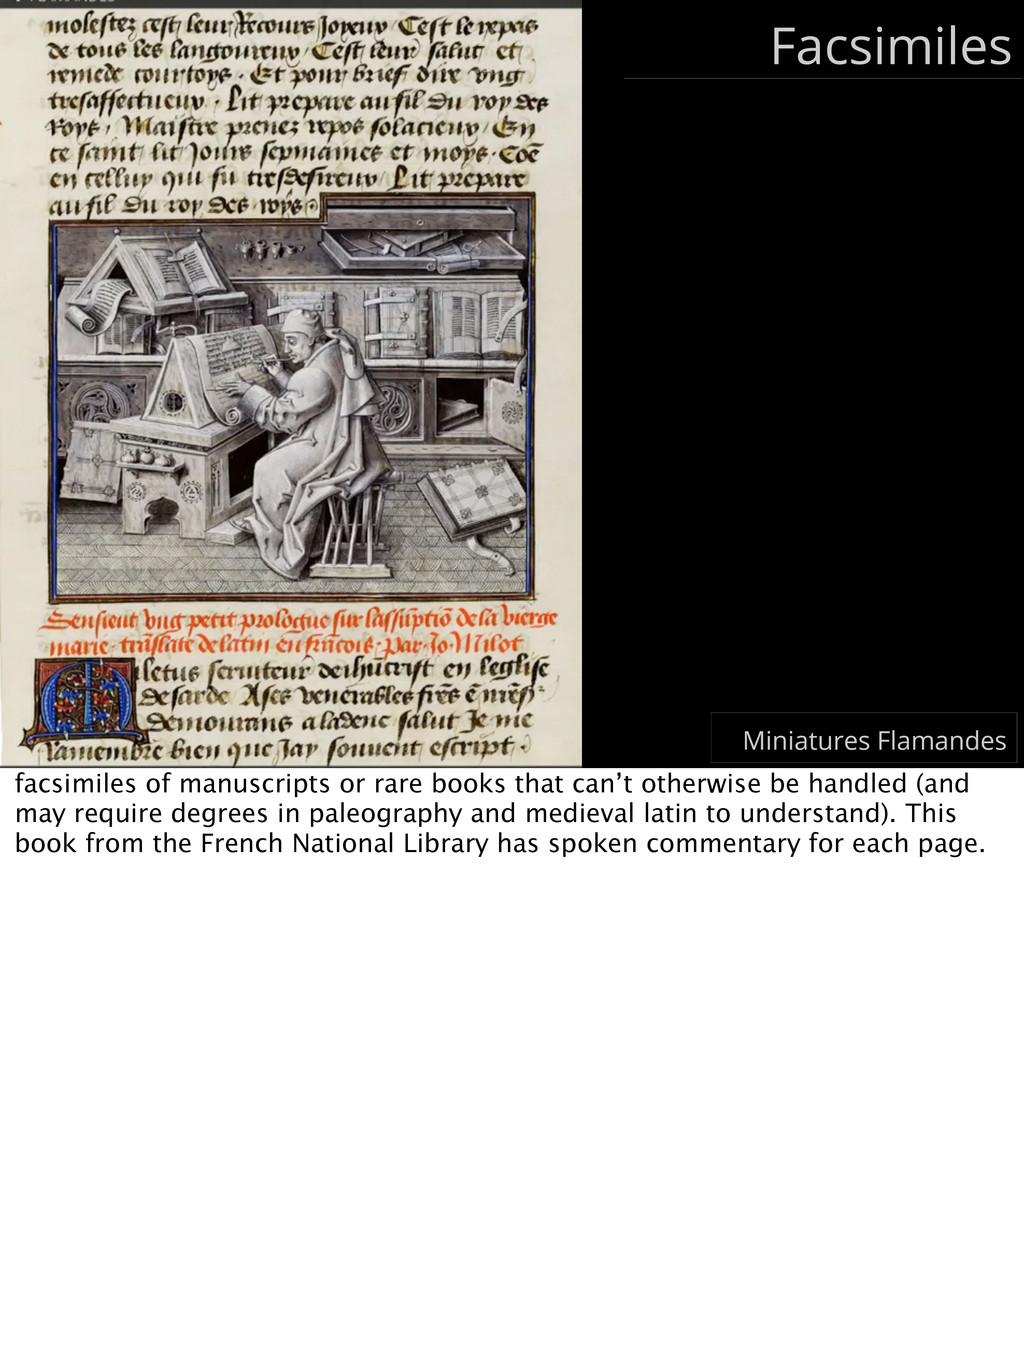 Facsimiles Miniatures Flamandes facsimiles of m...